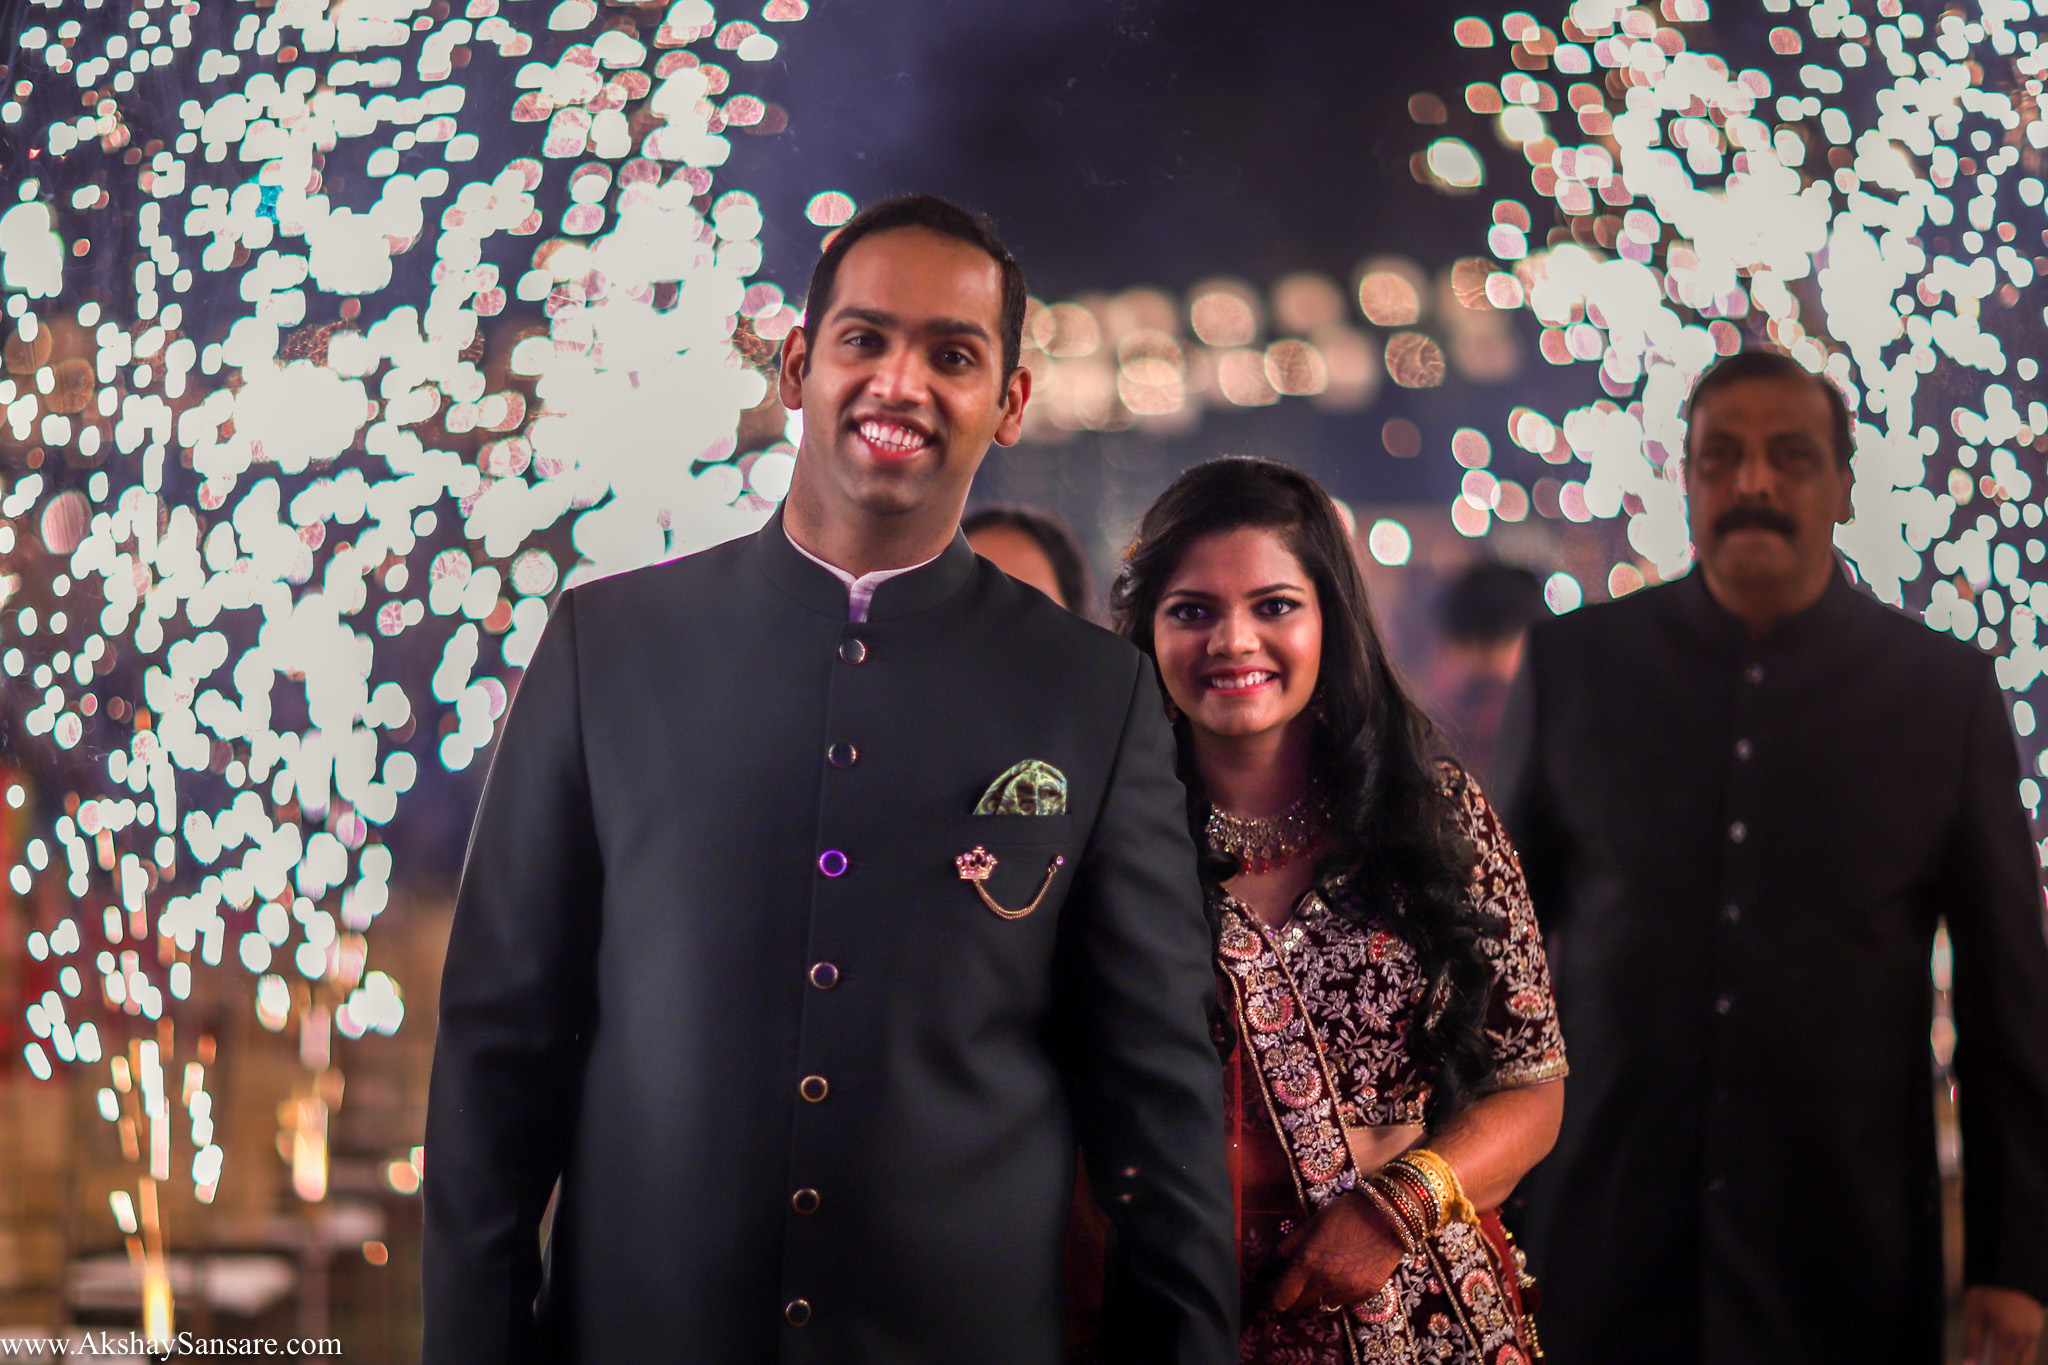 Salil x Kimaya Akshay Sansare Photography Candid wedding Photographer in mumbai best(42).jpg